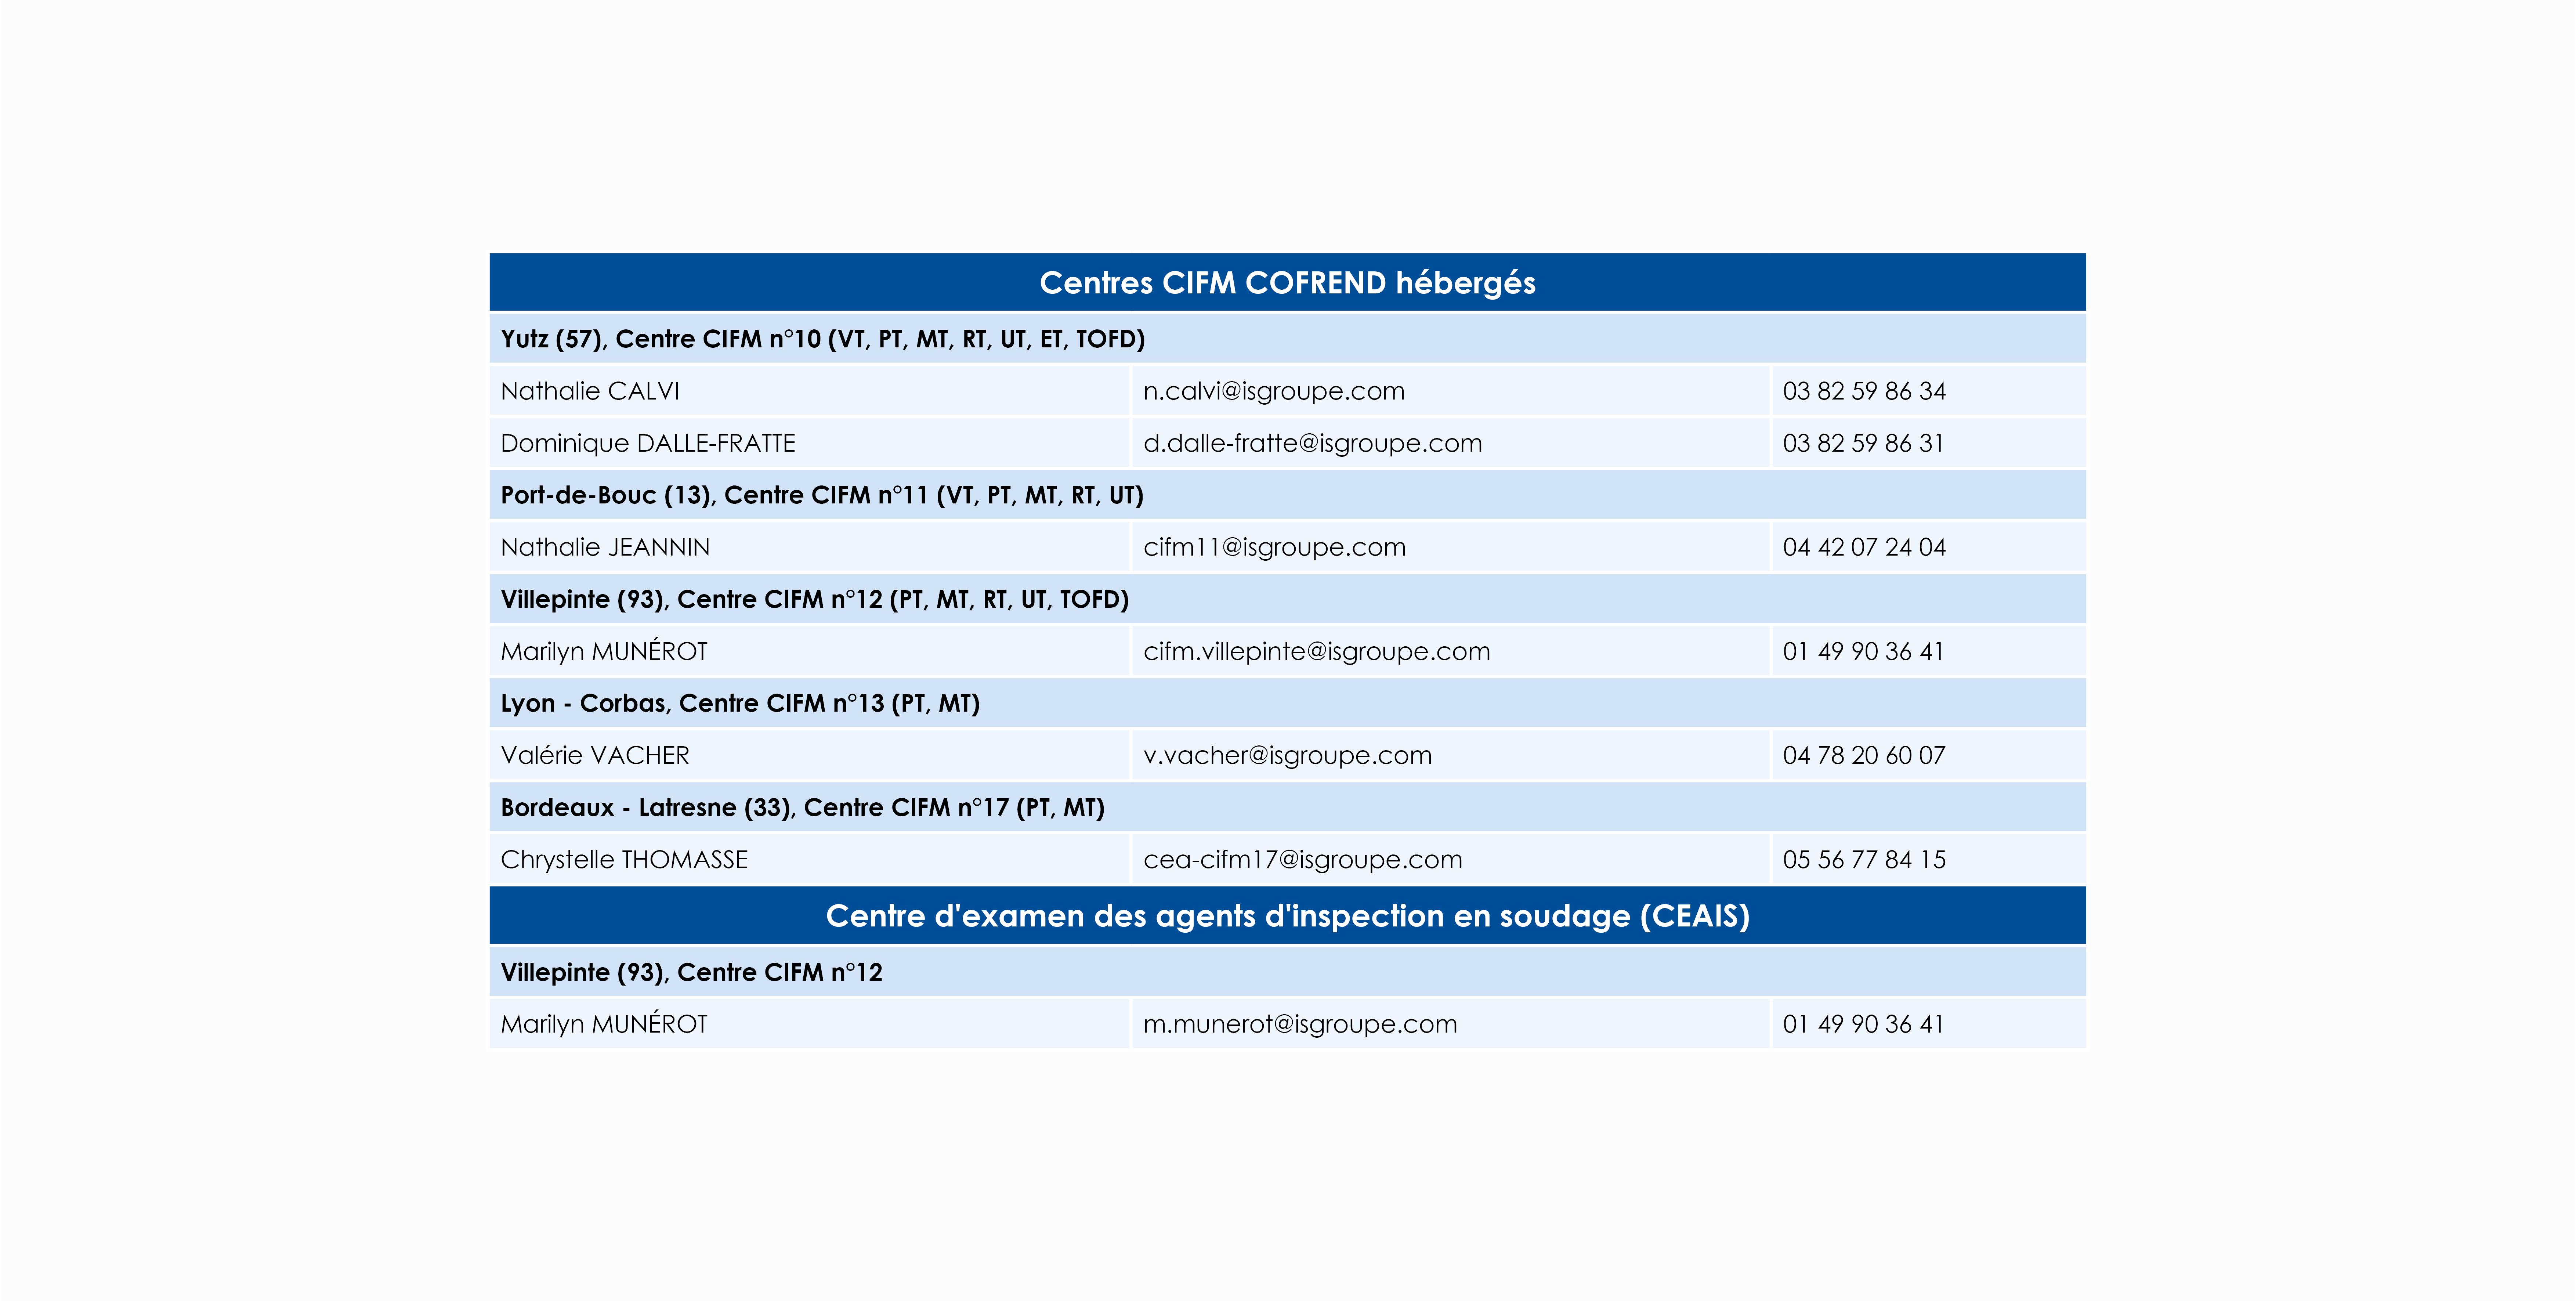 tableau certification des personnels_v2-2